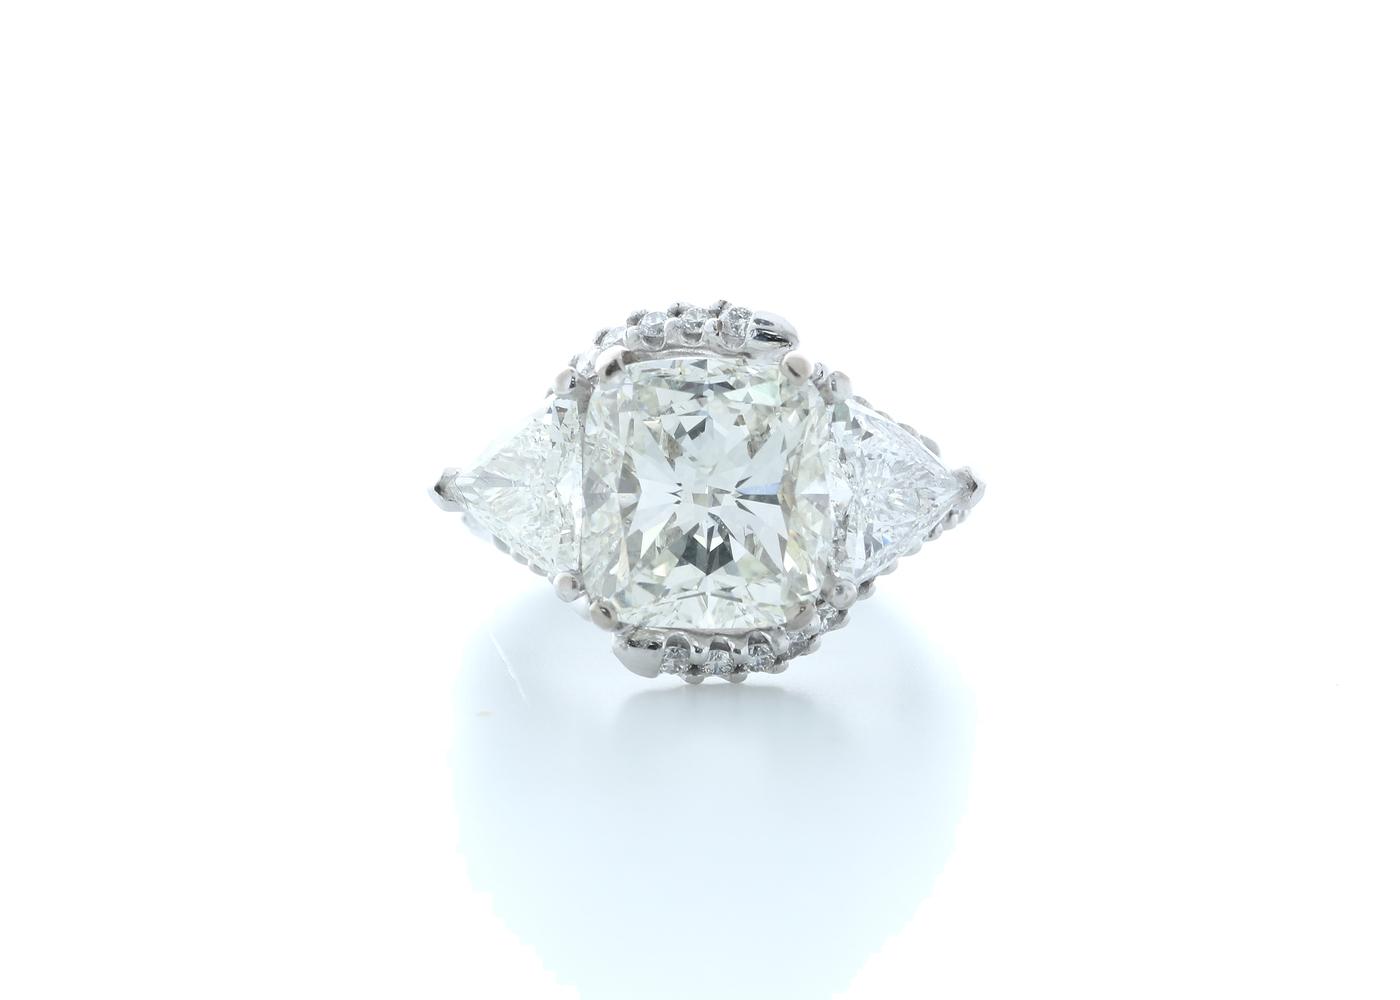 18ct White Gold Cushion Diamond Ring 7.03 (4.51) Carats